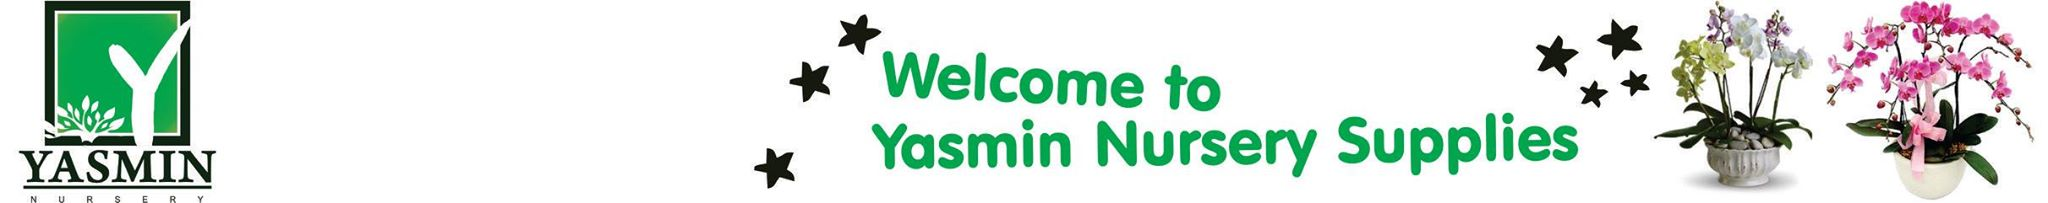 Yasmin Nursery